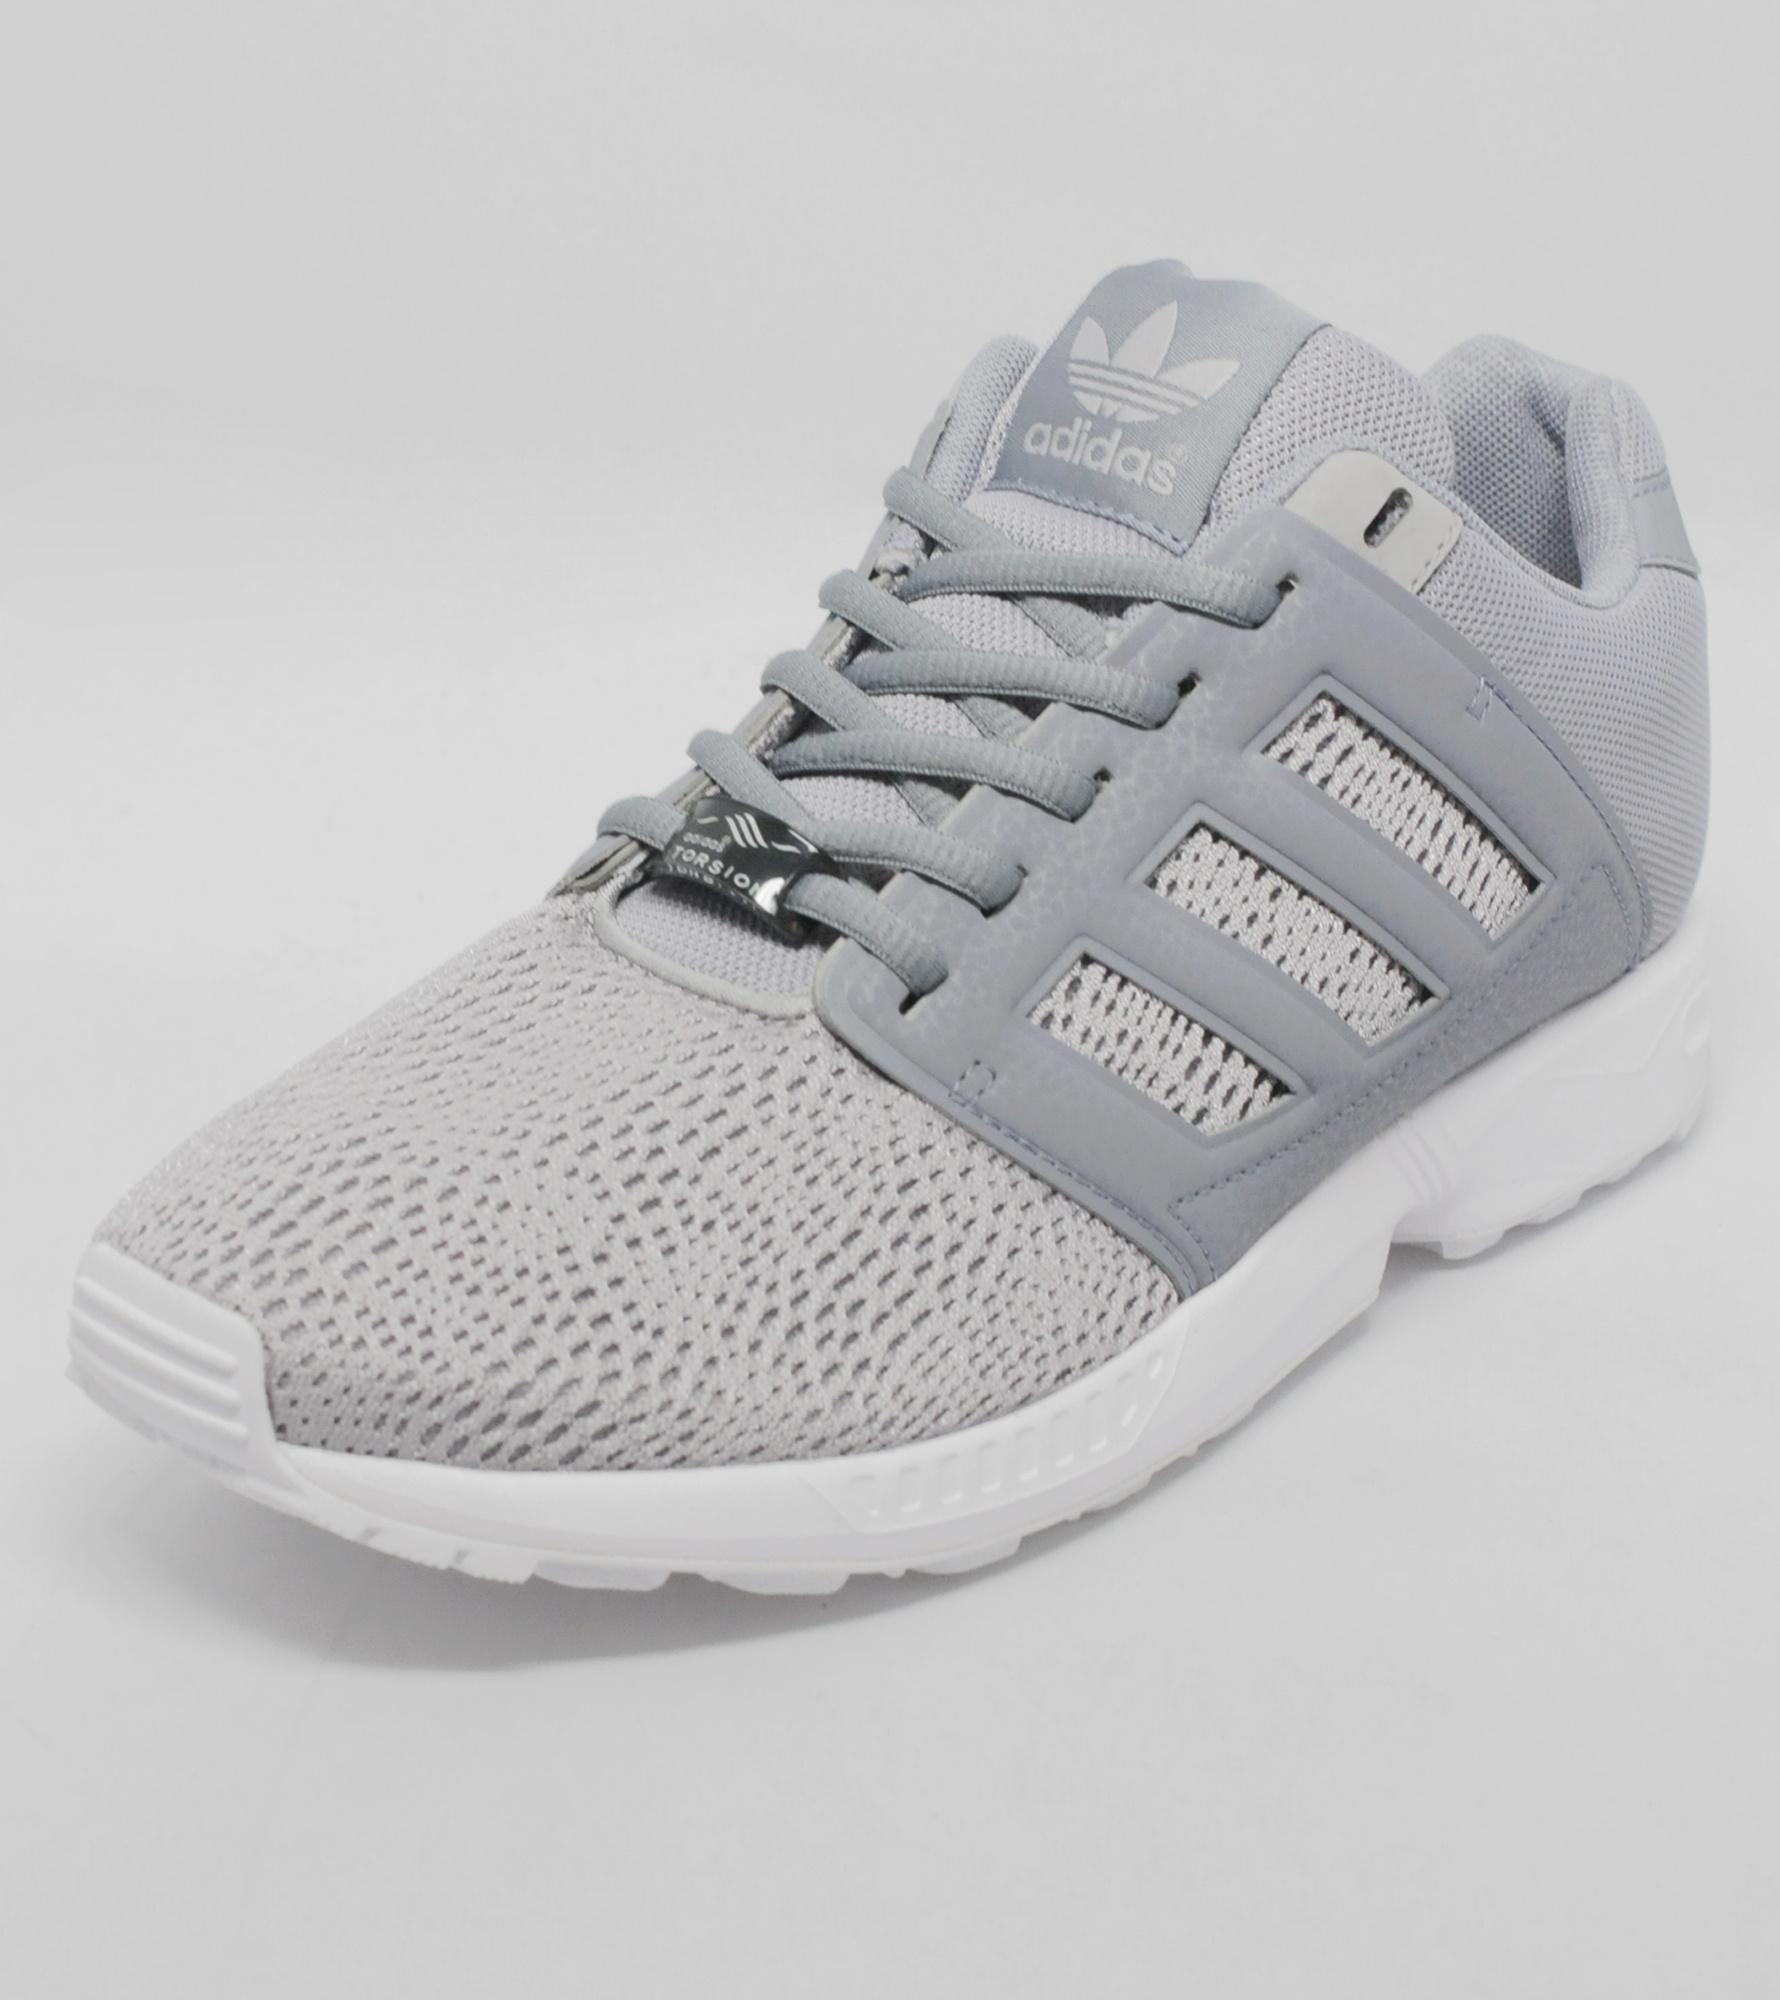 zx flux 2.0 grey